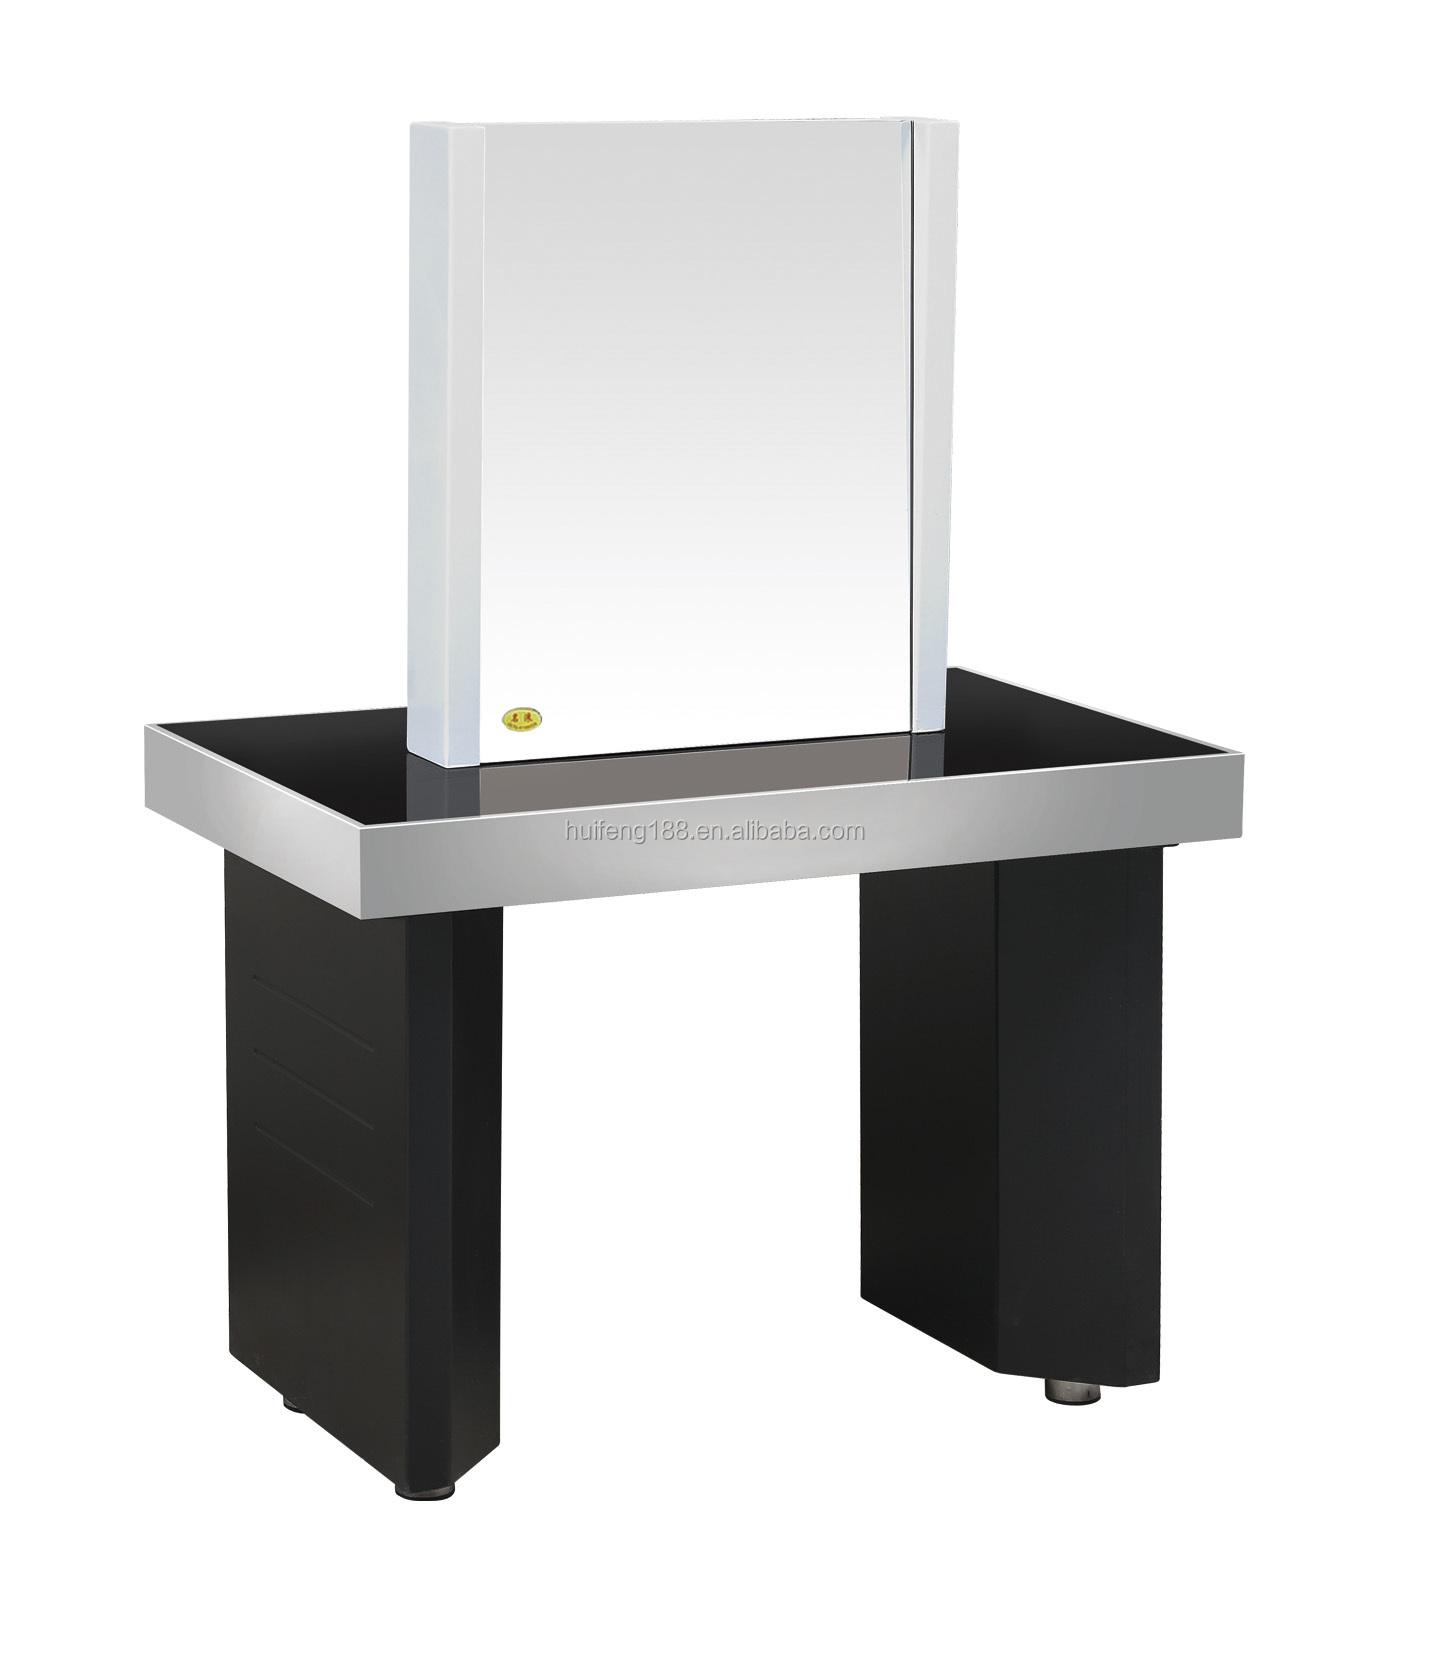 quipement de salon de coiffure 2014 vente chaude huifeng. Black Bedroom Furniture Sets. Home Design Ideas